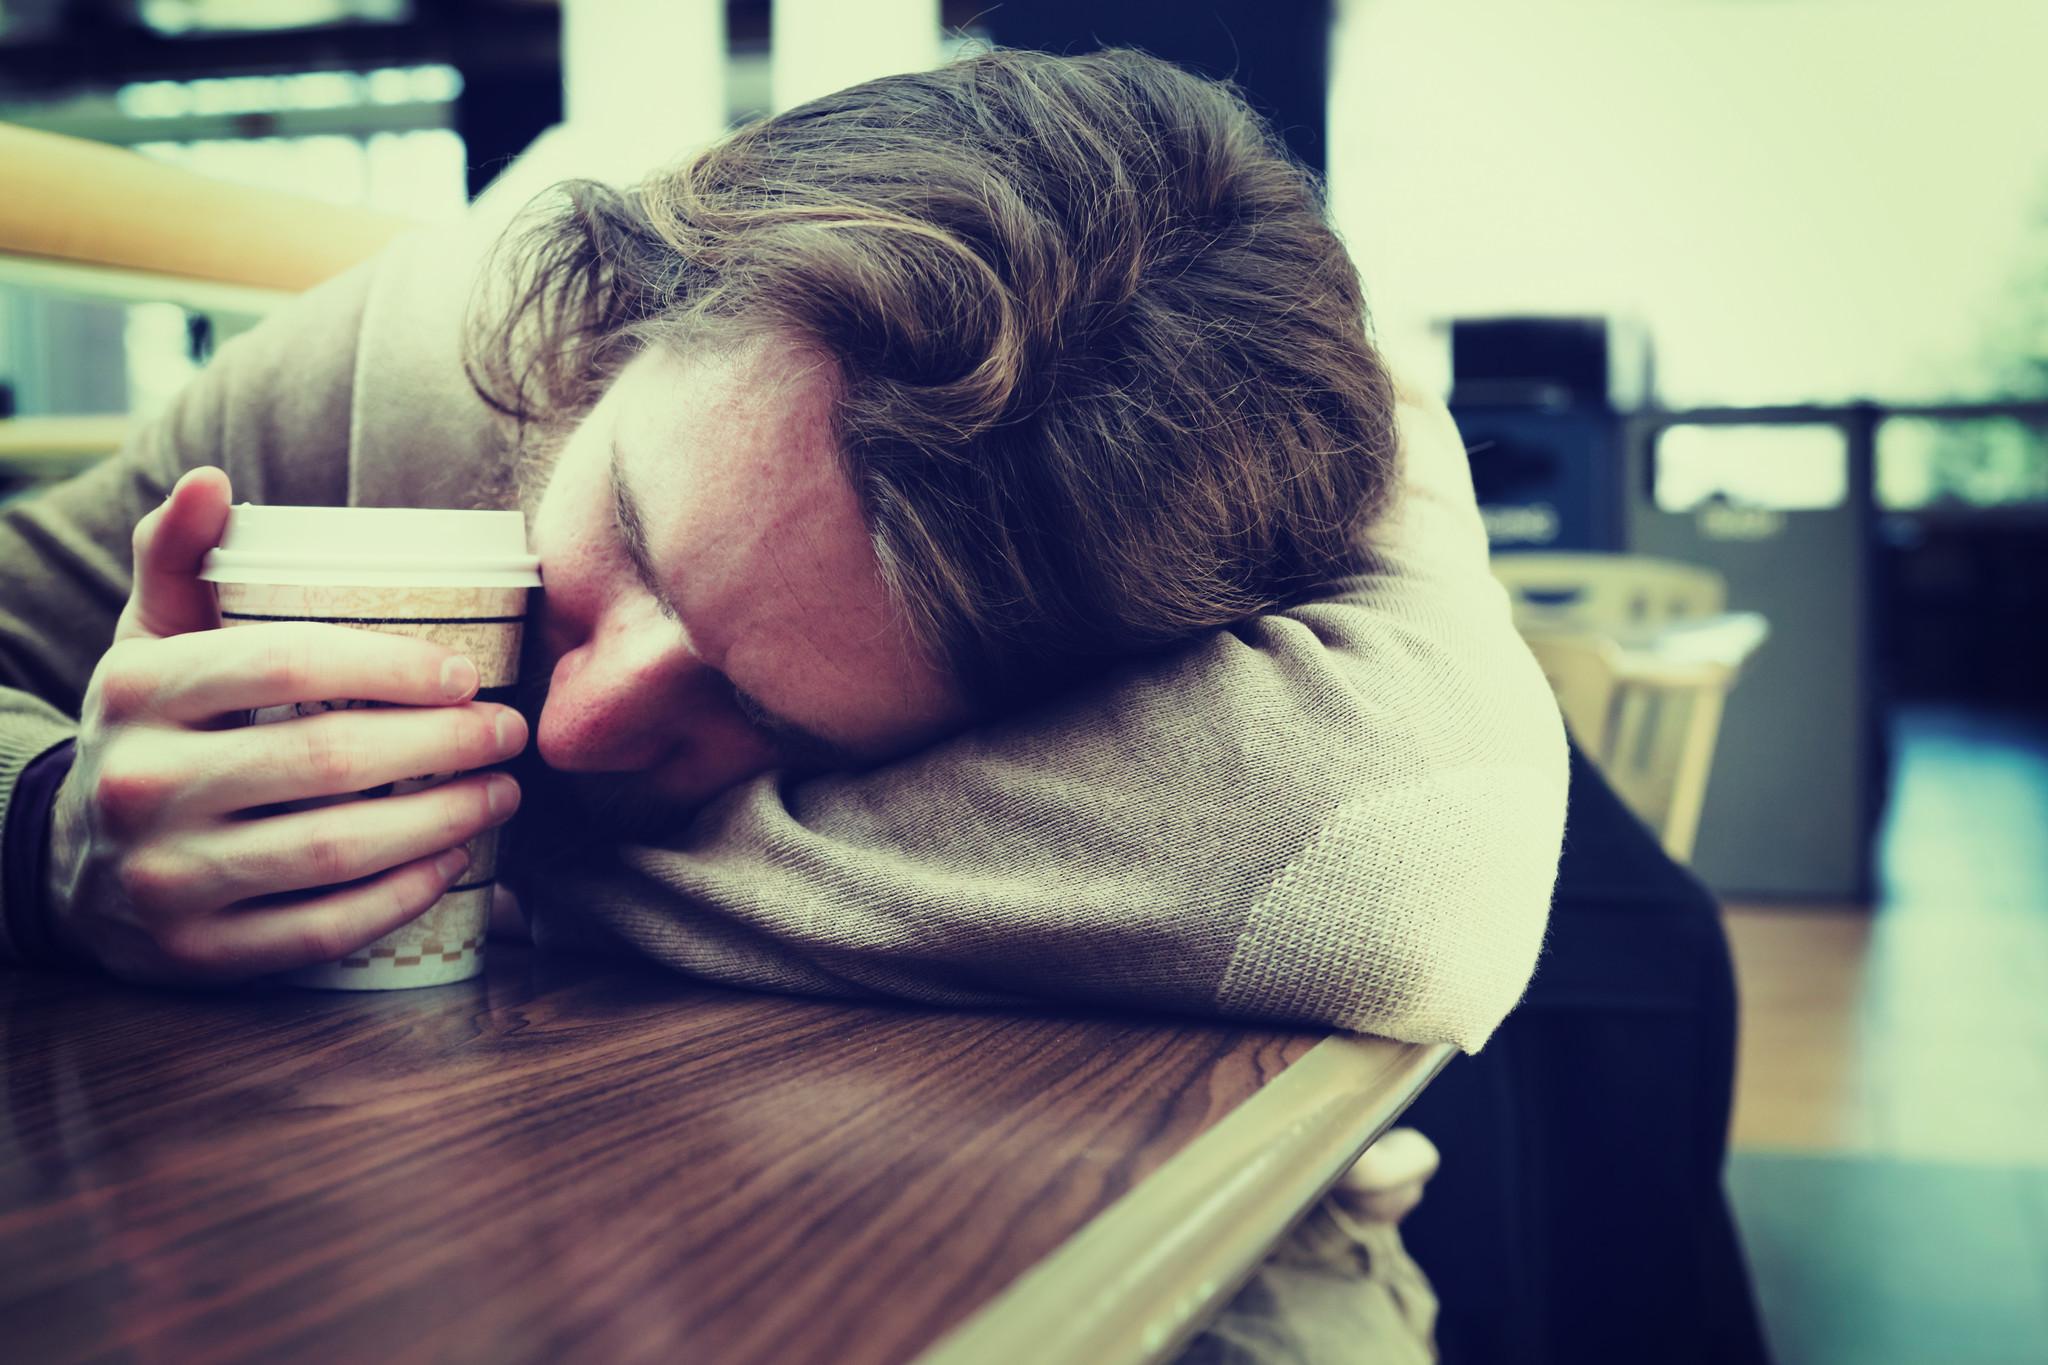 Caffeine withdrawal in teens